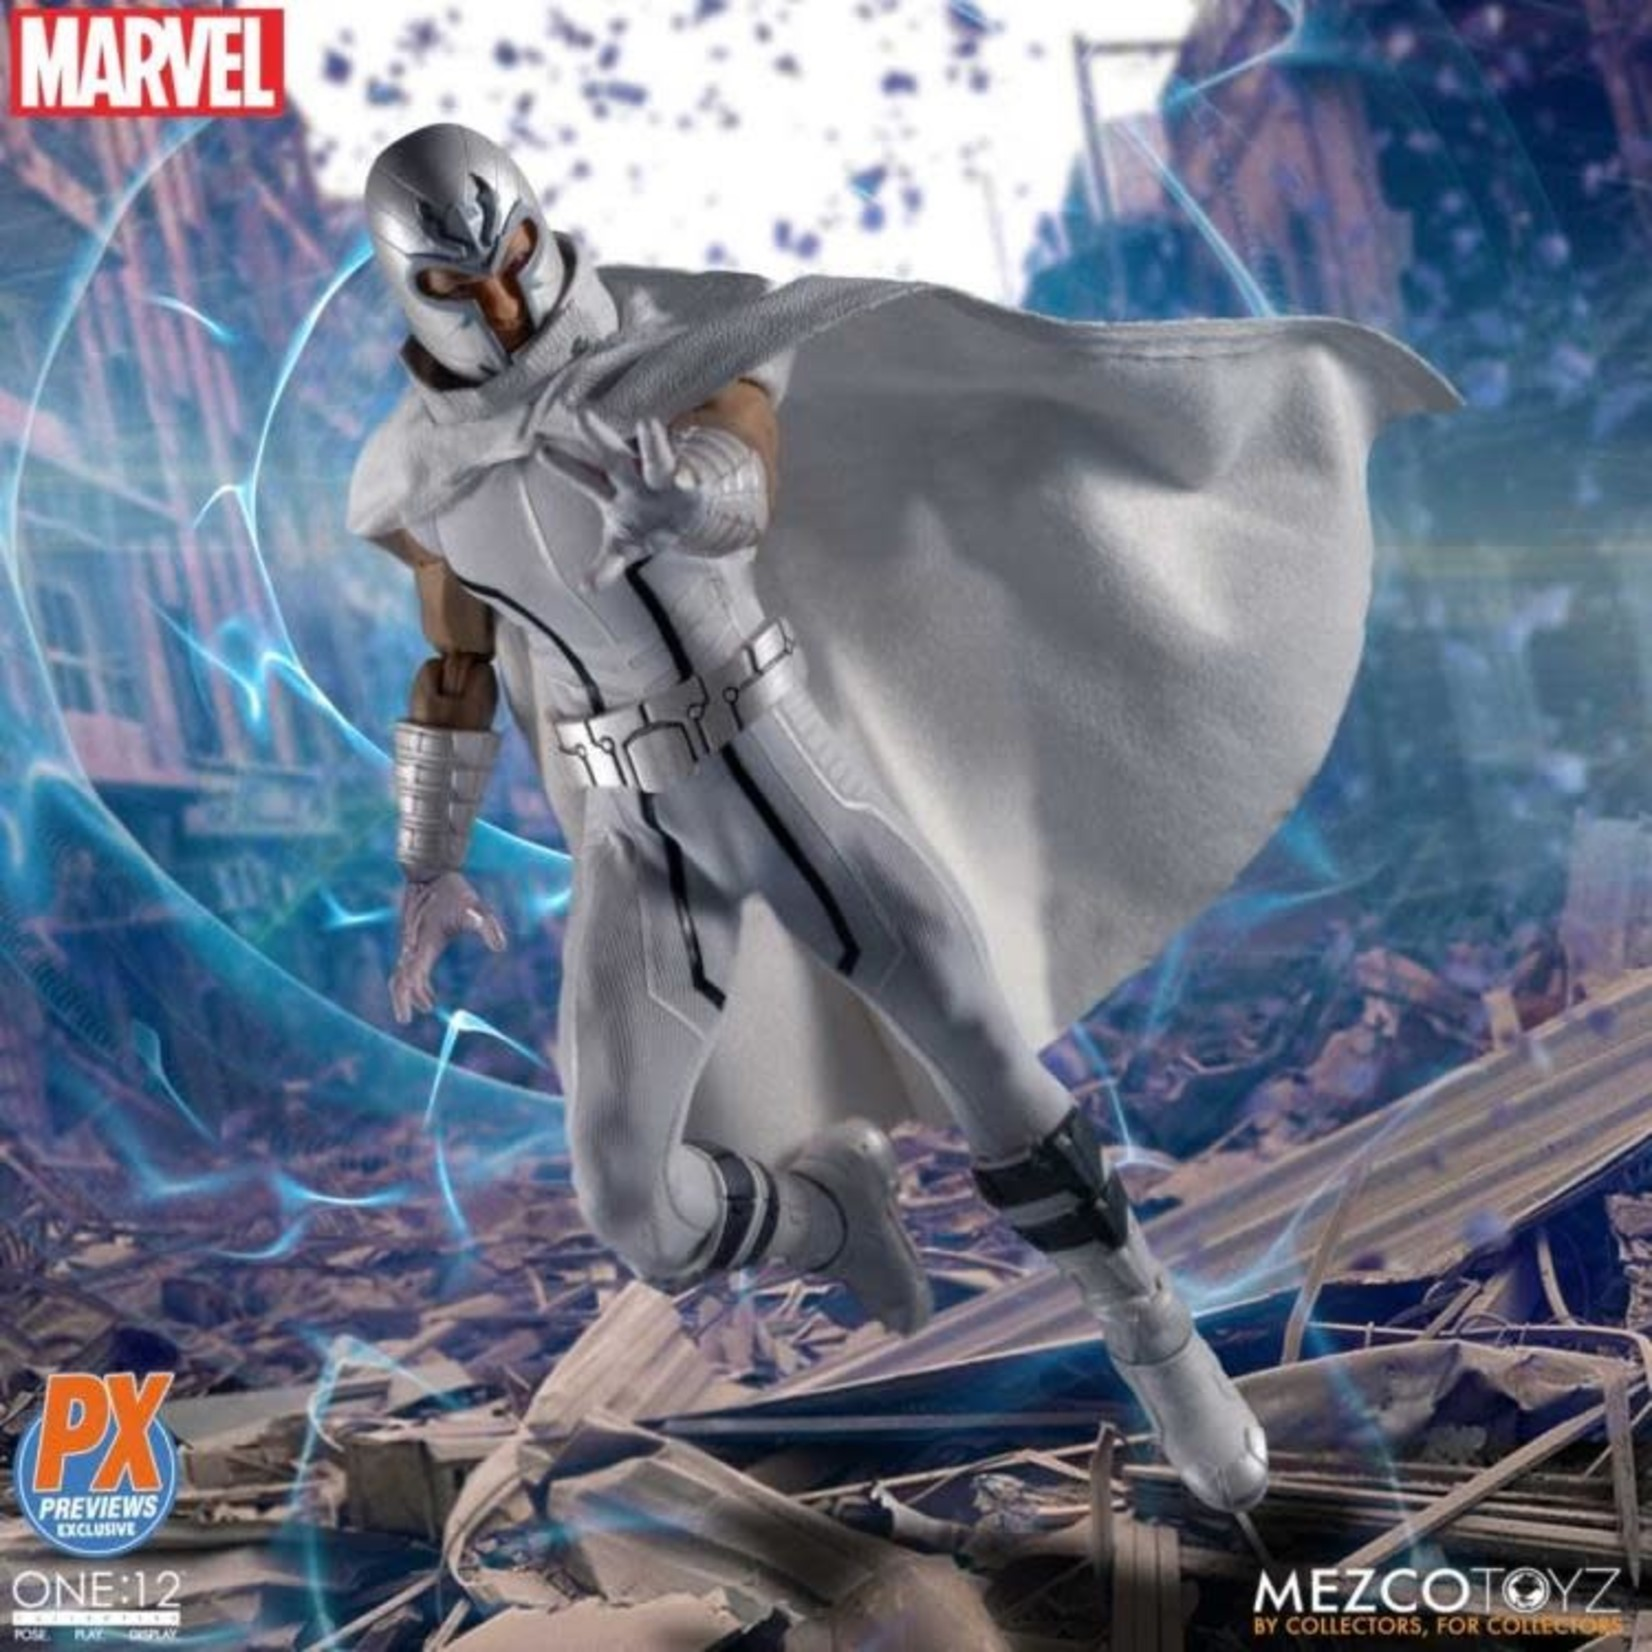 MezcoToyz X-Men Magneto Marvel NOW! Edition One:12 Figure - PX